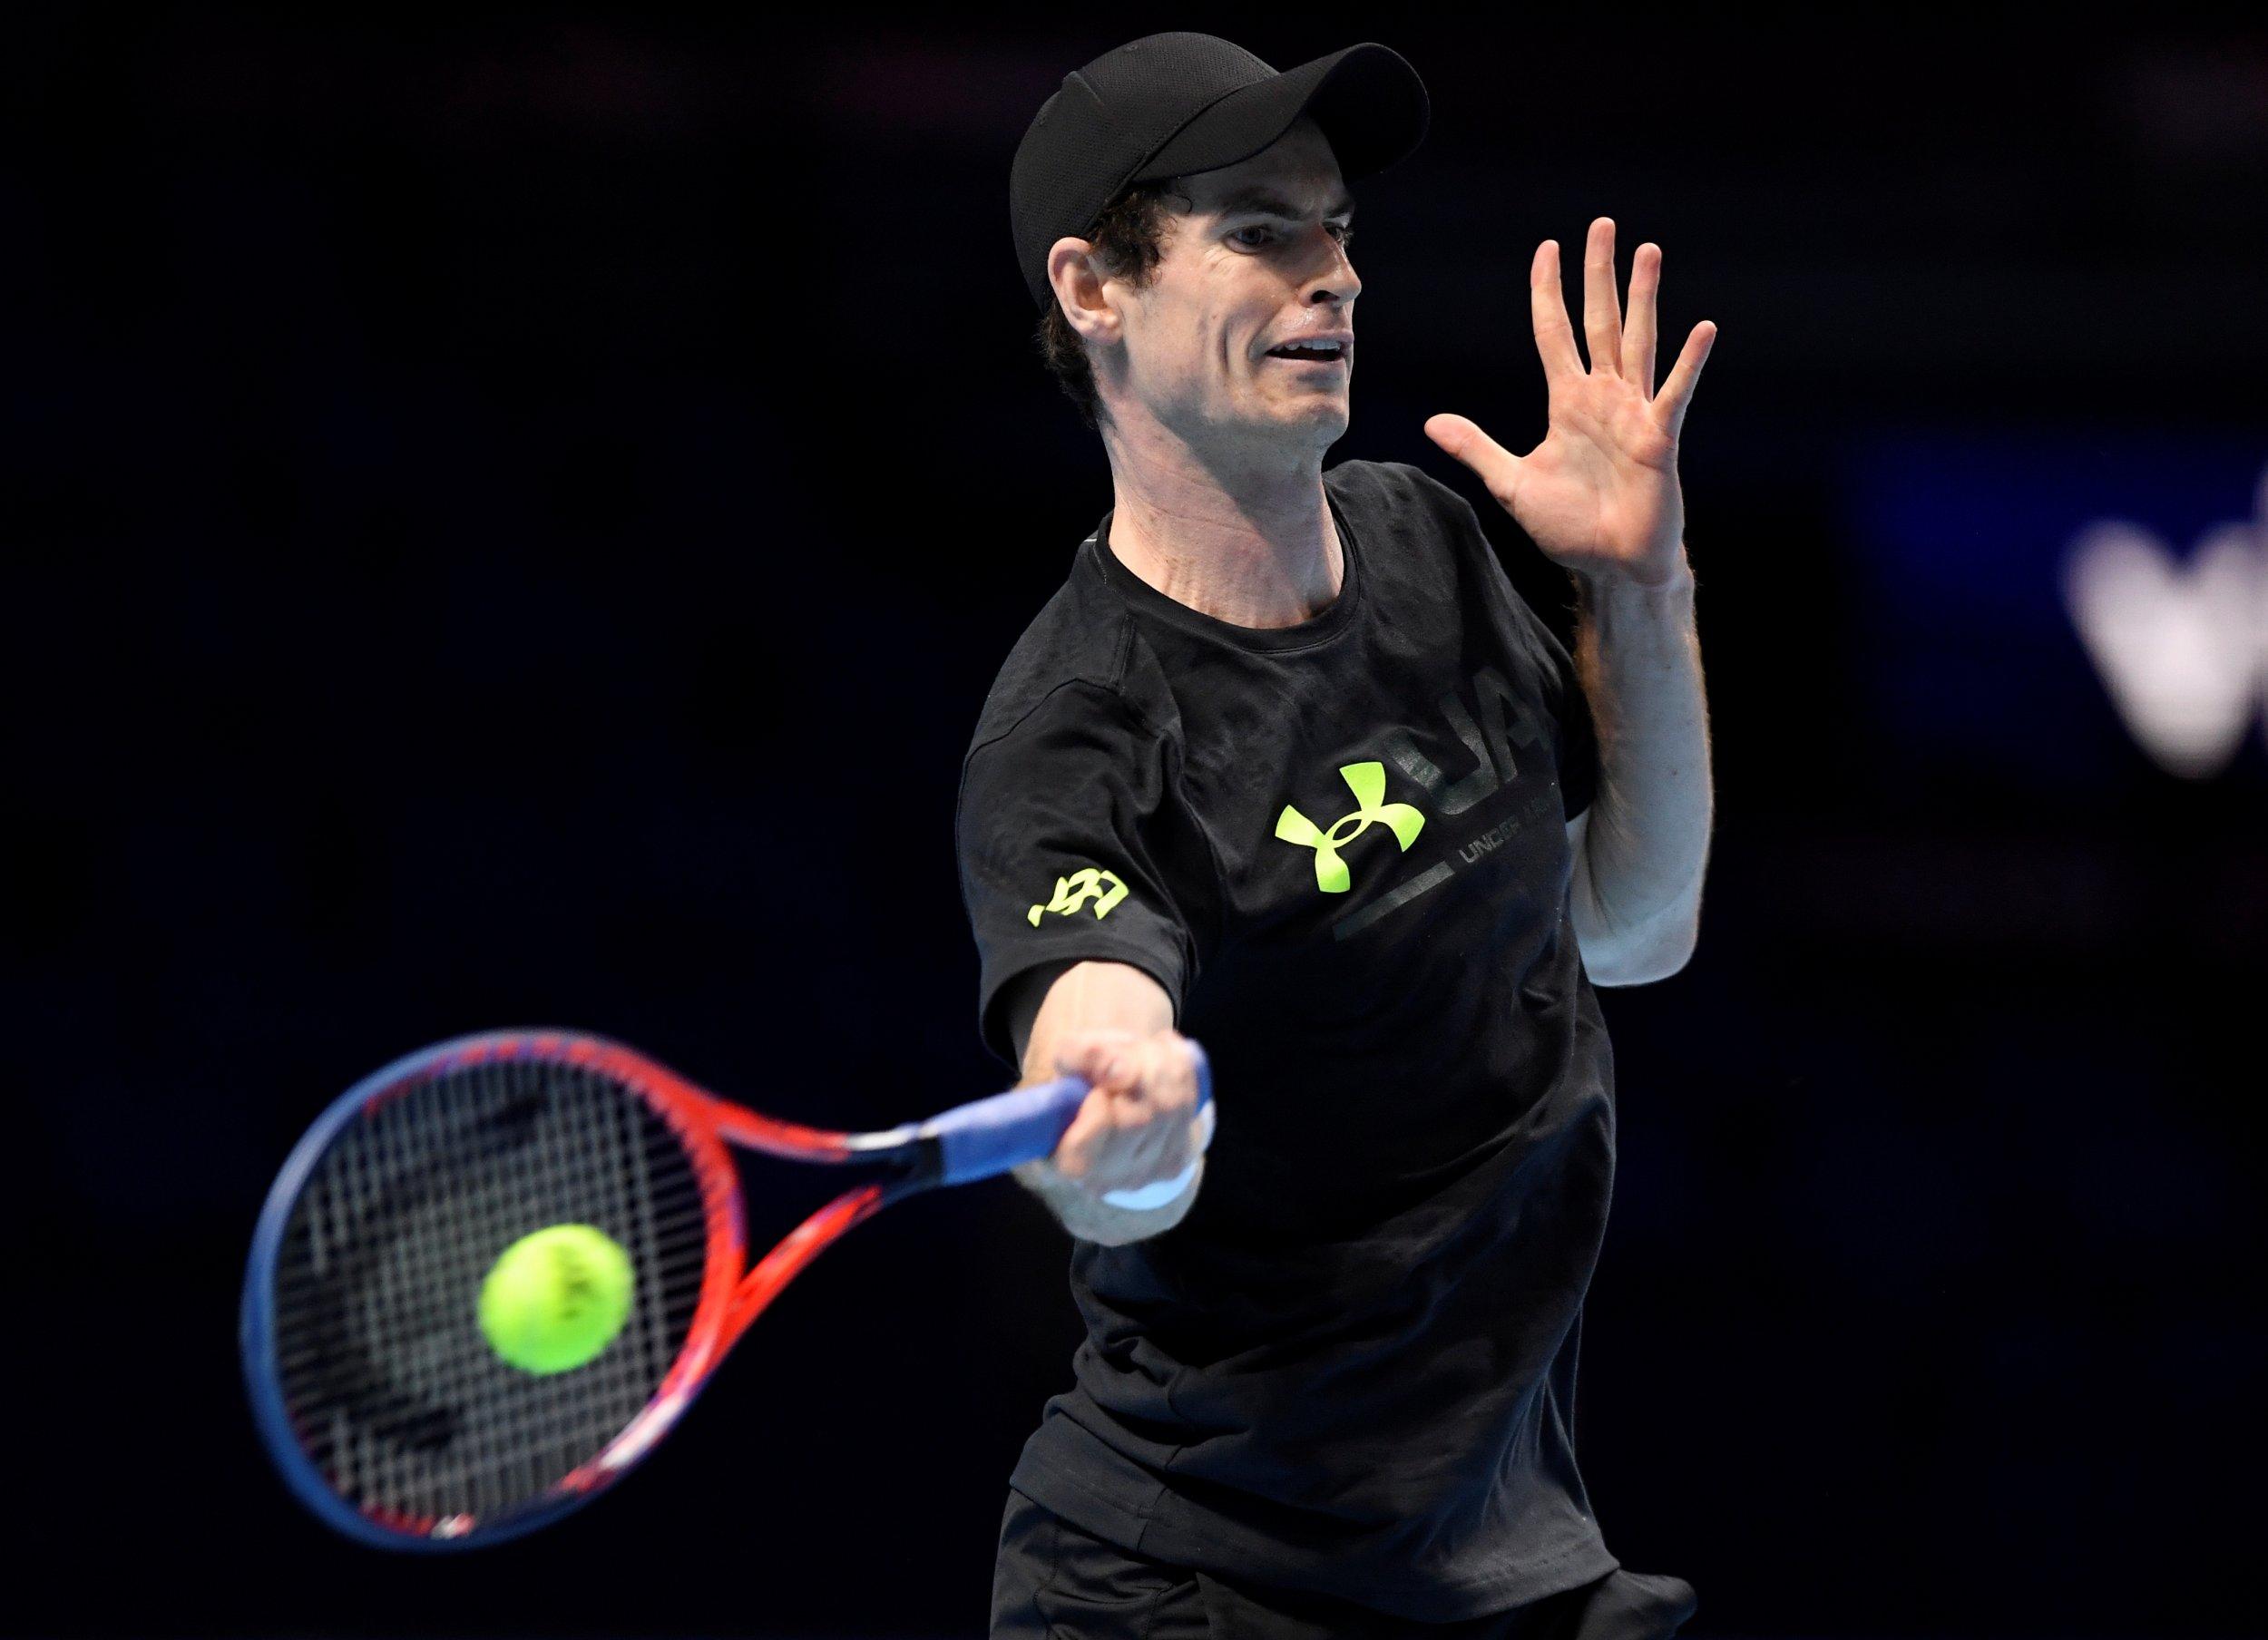 40 - Andy Murray ($28.8 million)